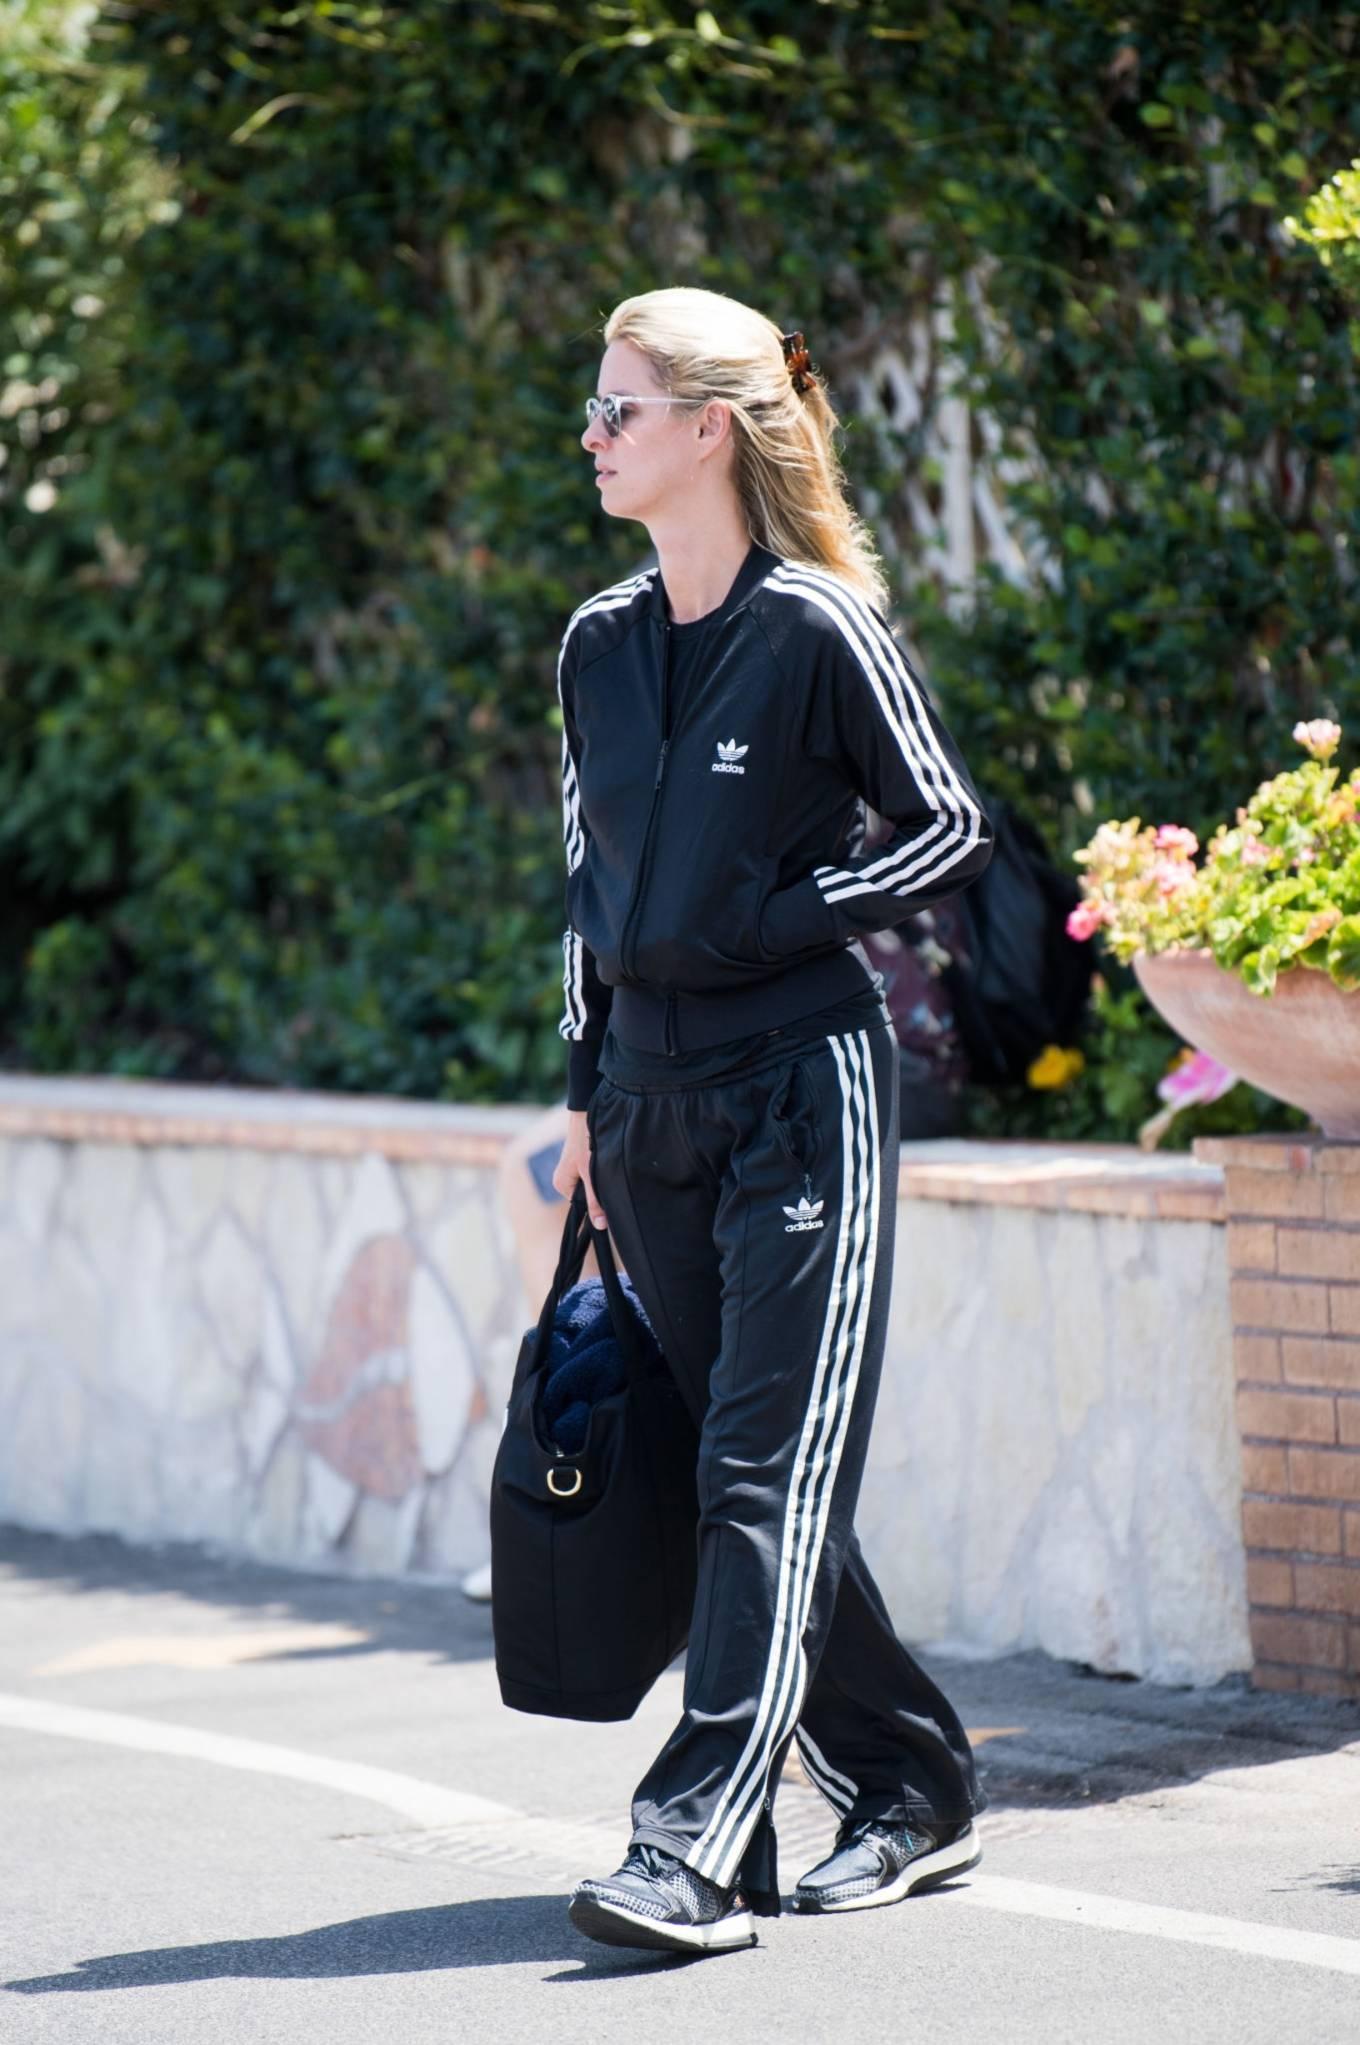 Nicky Hilton 2021 : Nicky Hilton – Seen in Capri ahead of the UNICEF italia and LuisaViaRoma summer gala -04